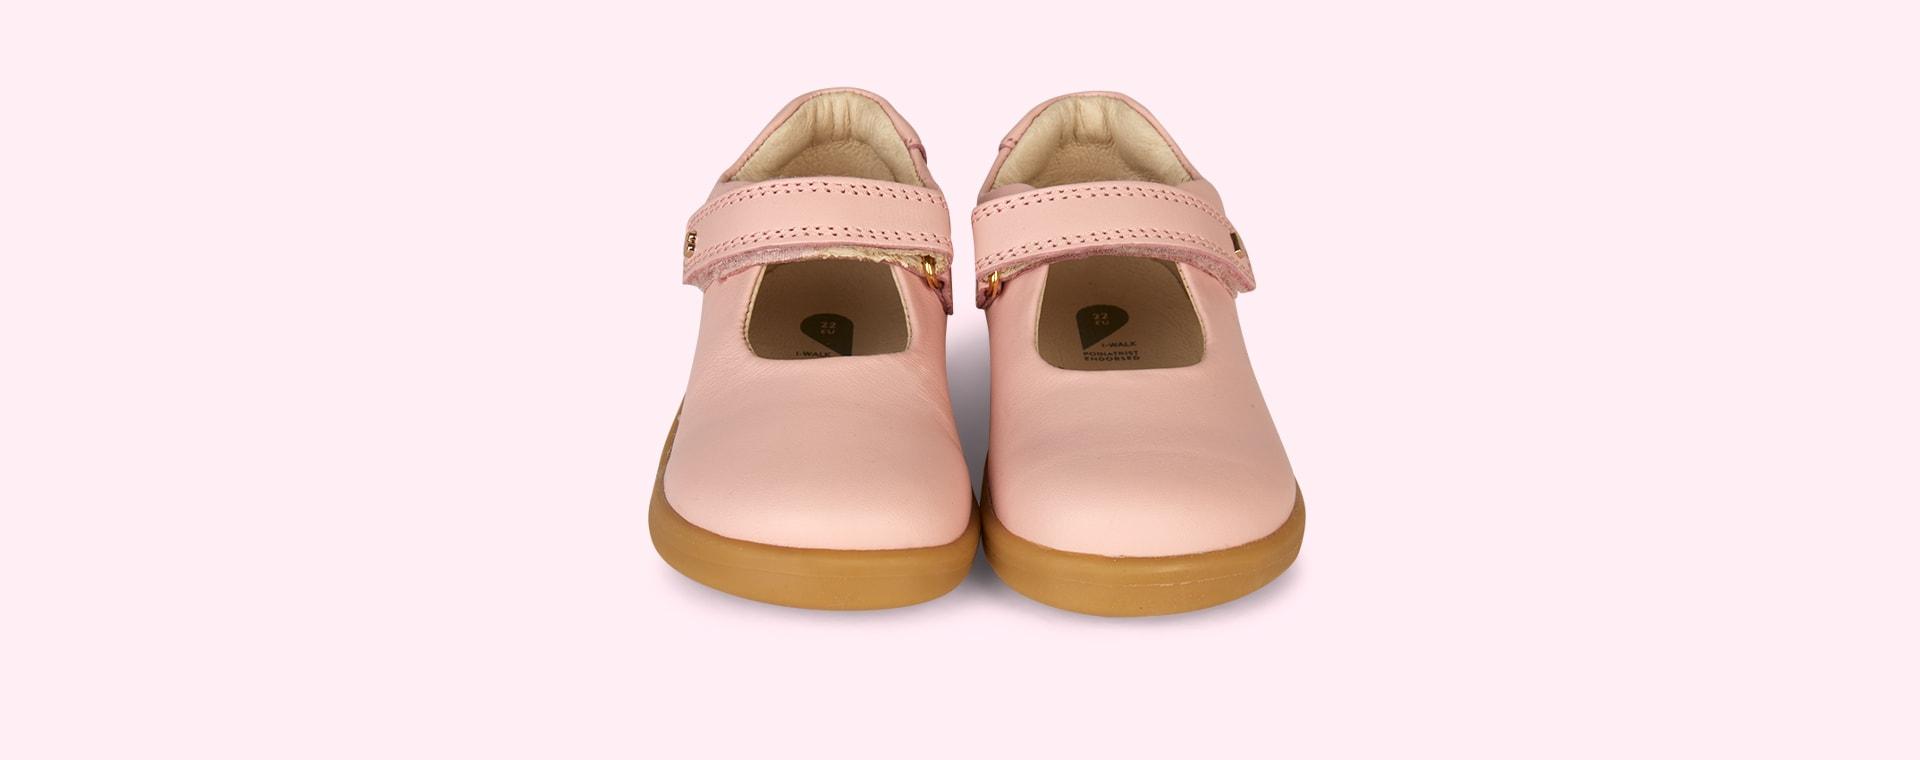 Seashell Bobux I-Walk Delight Mary Jane Shoe